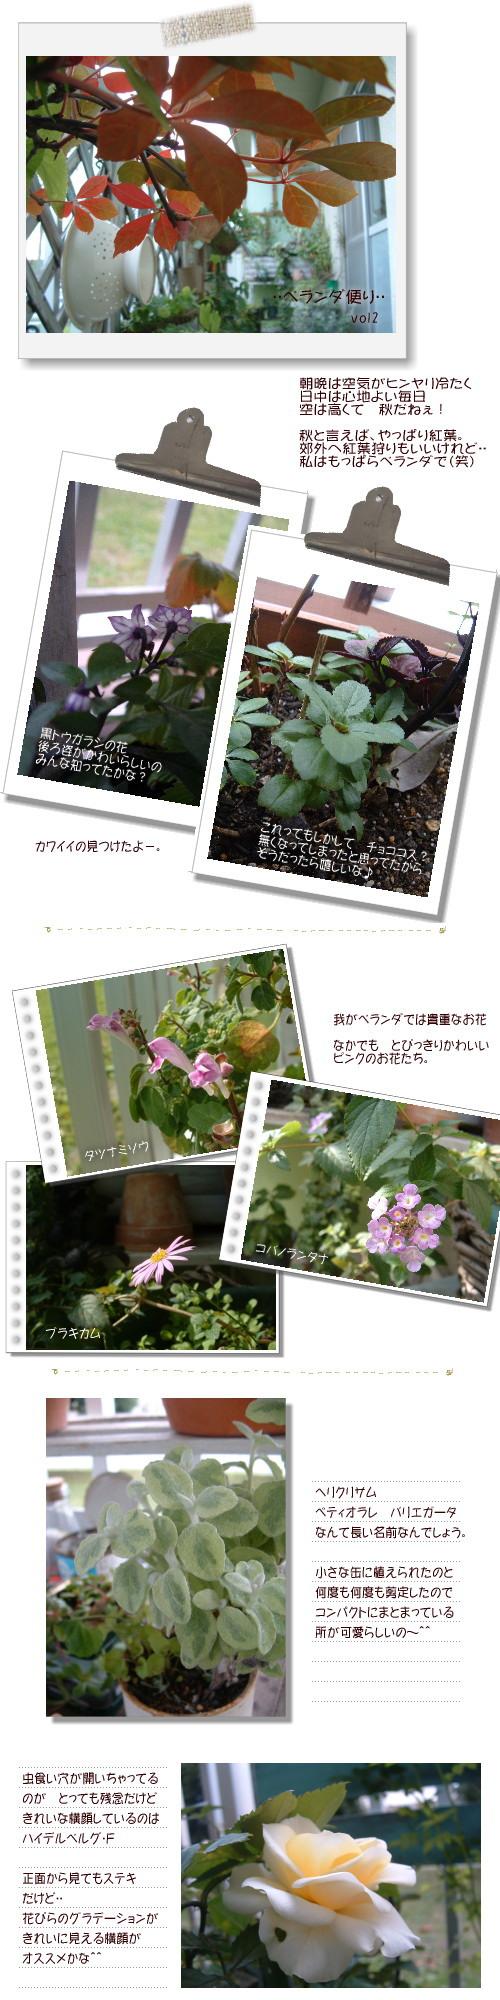 DSC60511.jpg